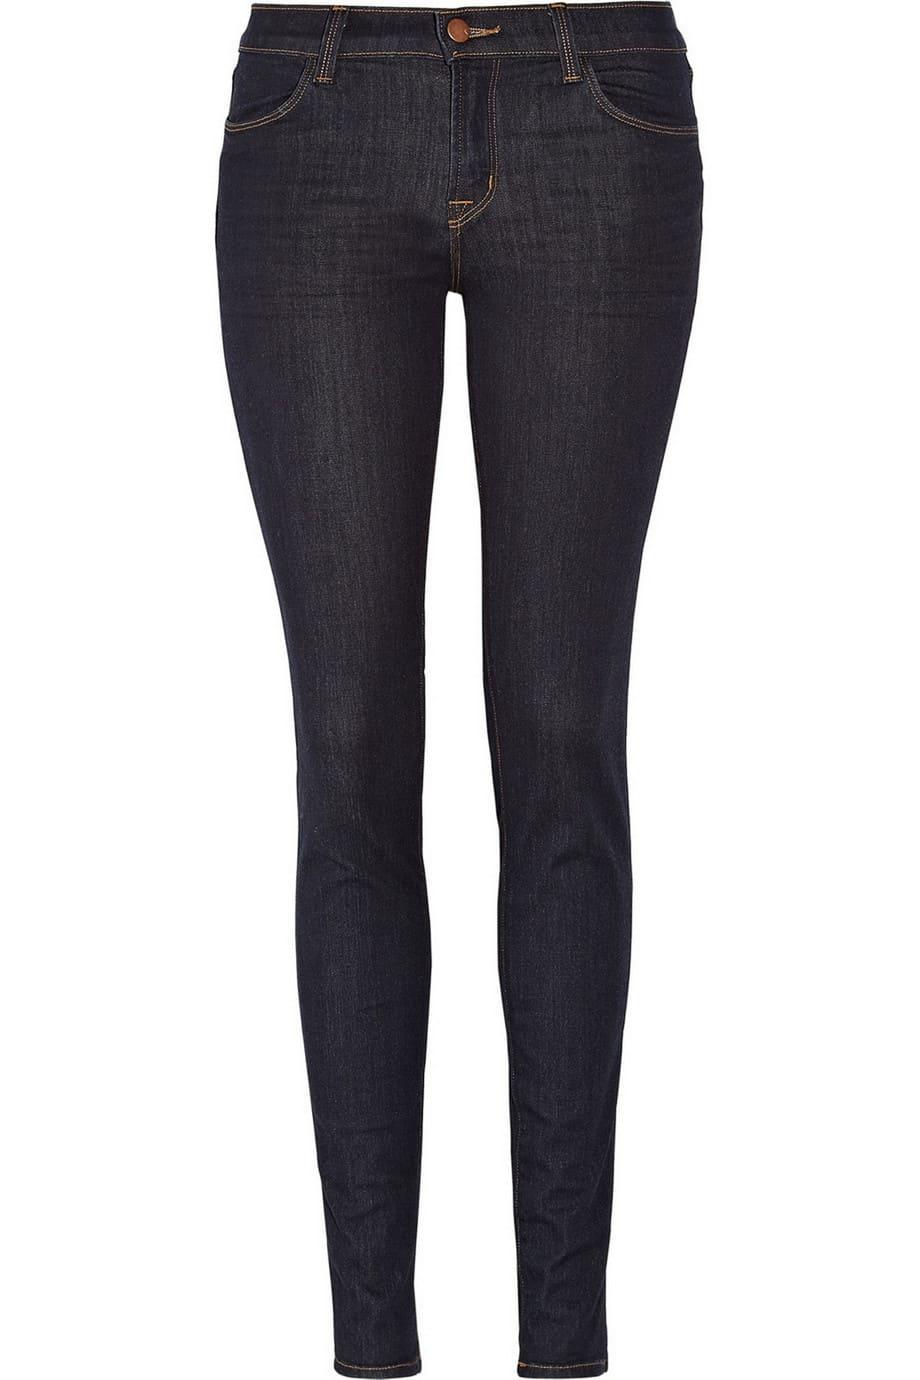 image Arborer le look de (Black Widow) Natasha Romanoff en jeans J Brand 27